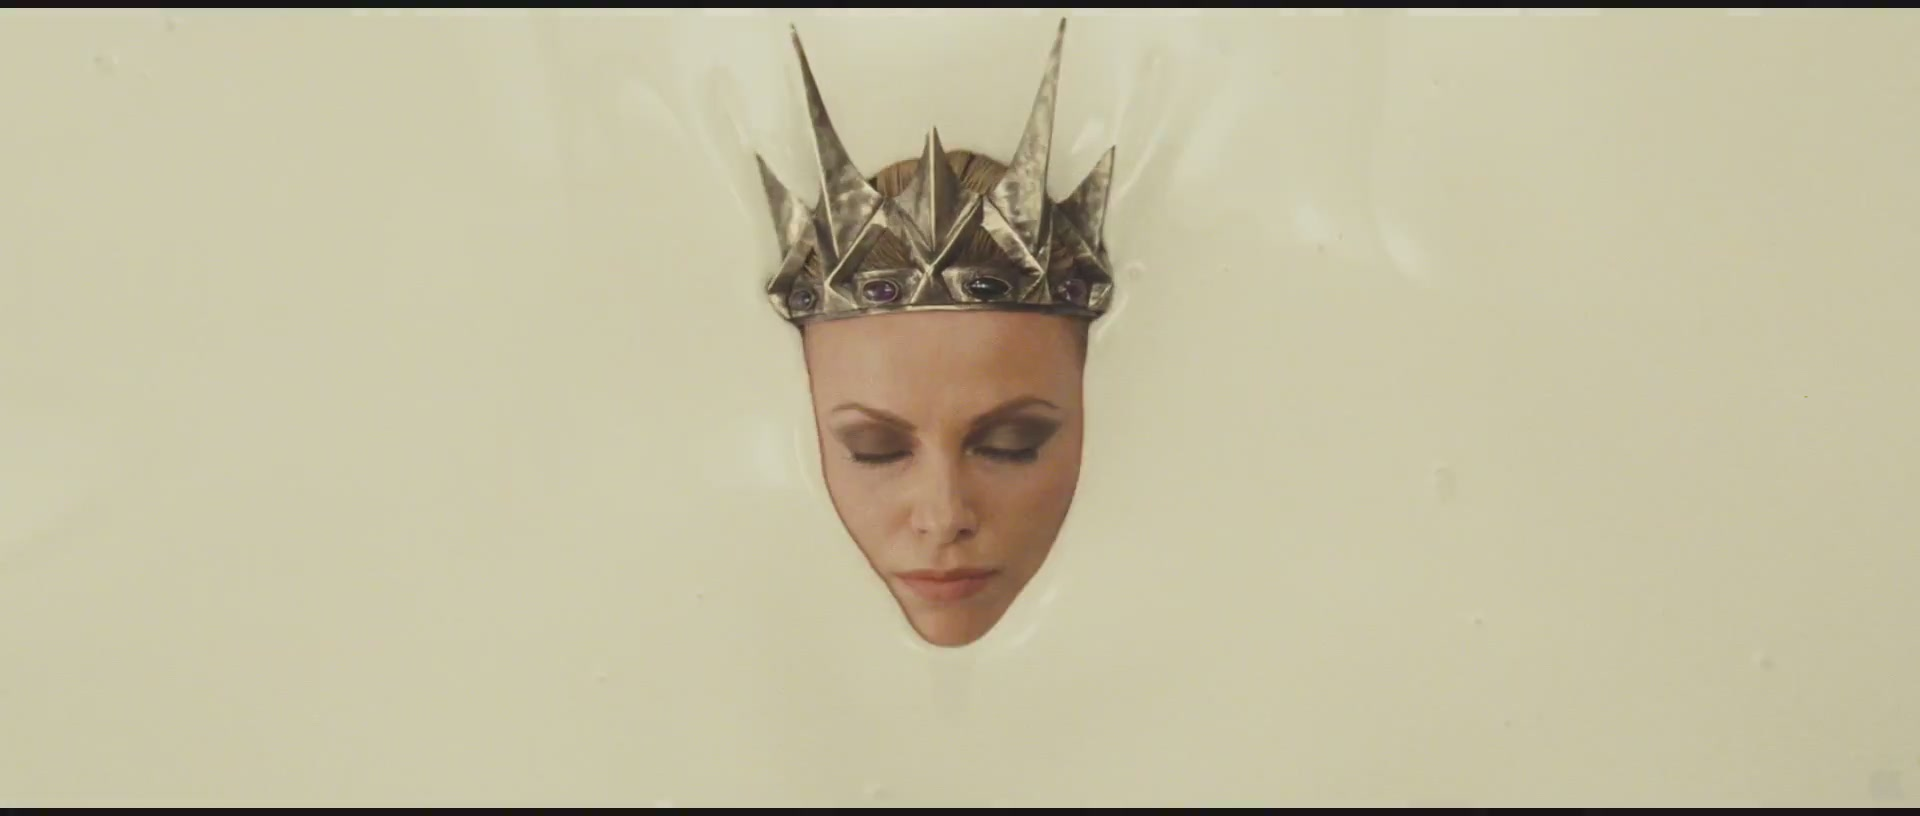 Charlize Theron Snow White Makeup actor david duchovny bio